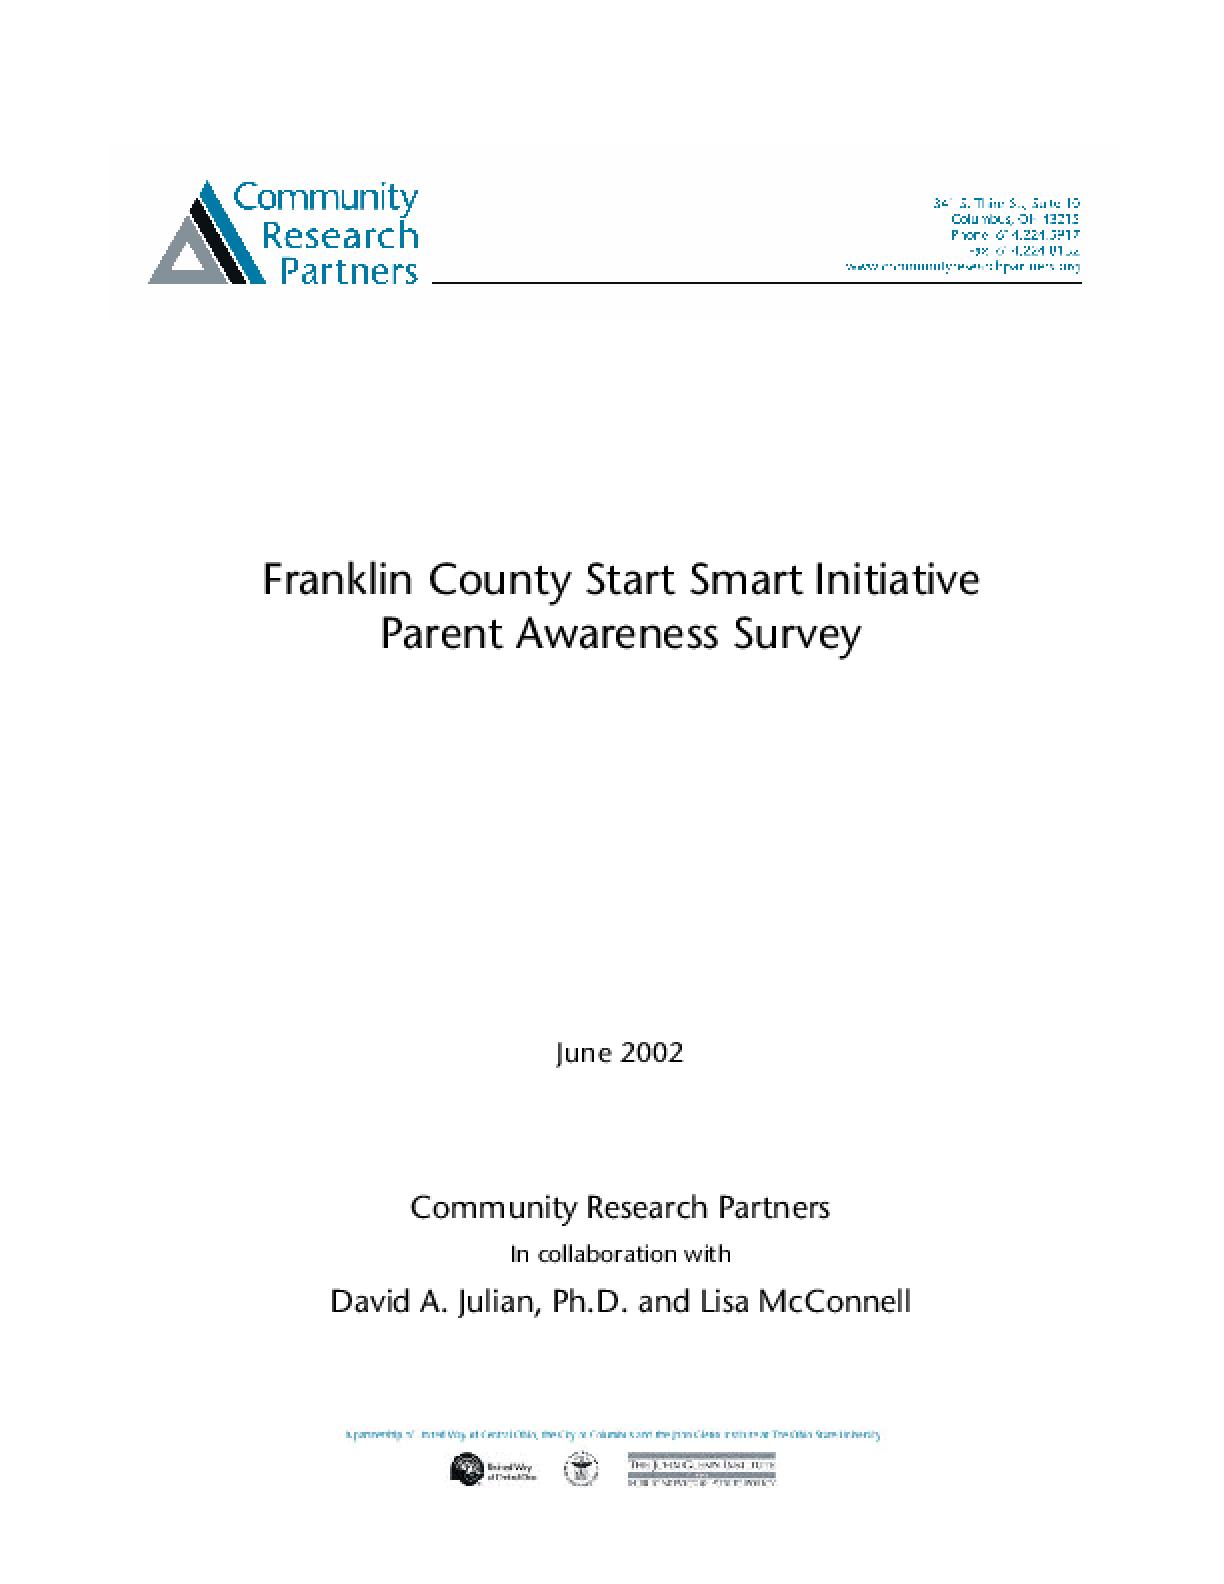 Franklin County Start Smart Initiative Parent Awareness Survey